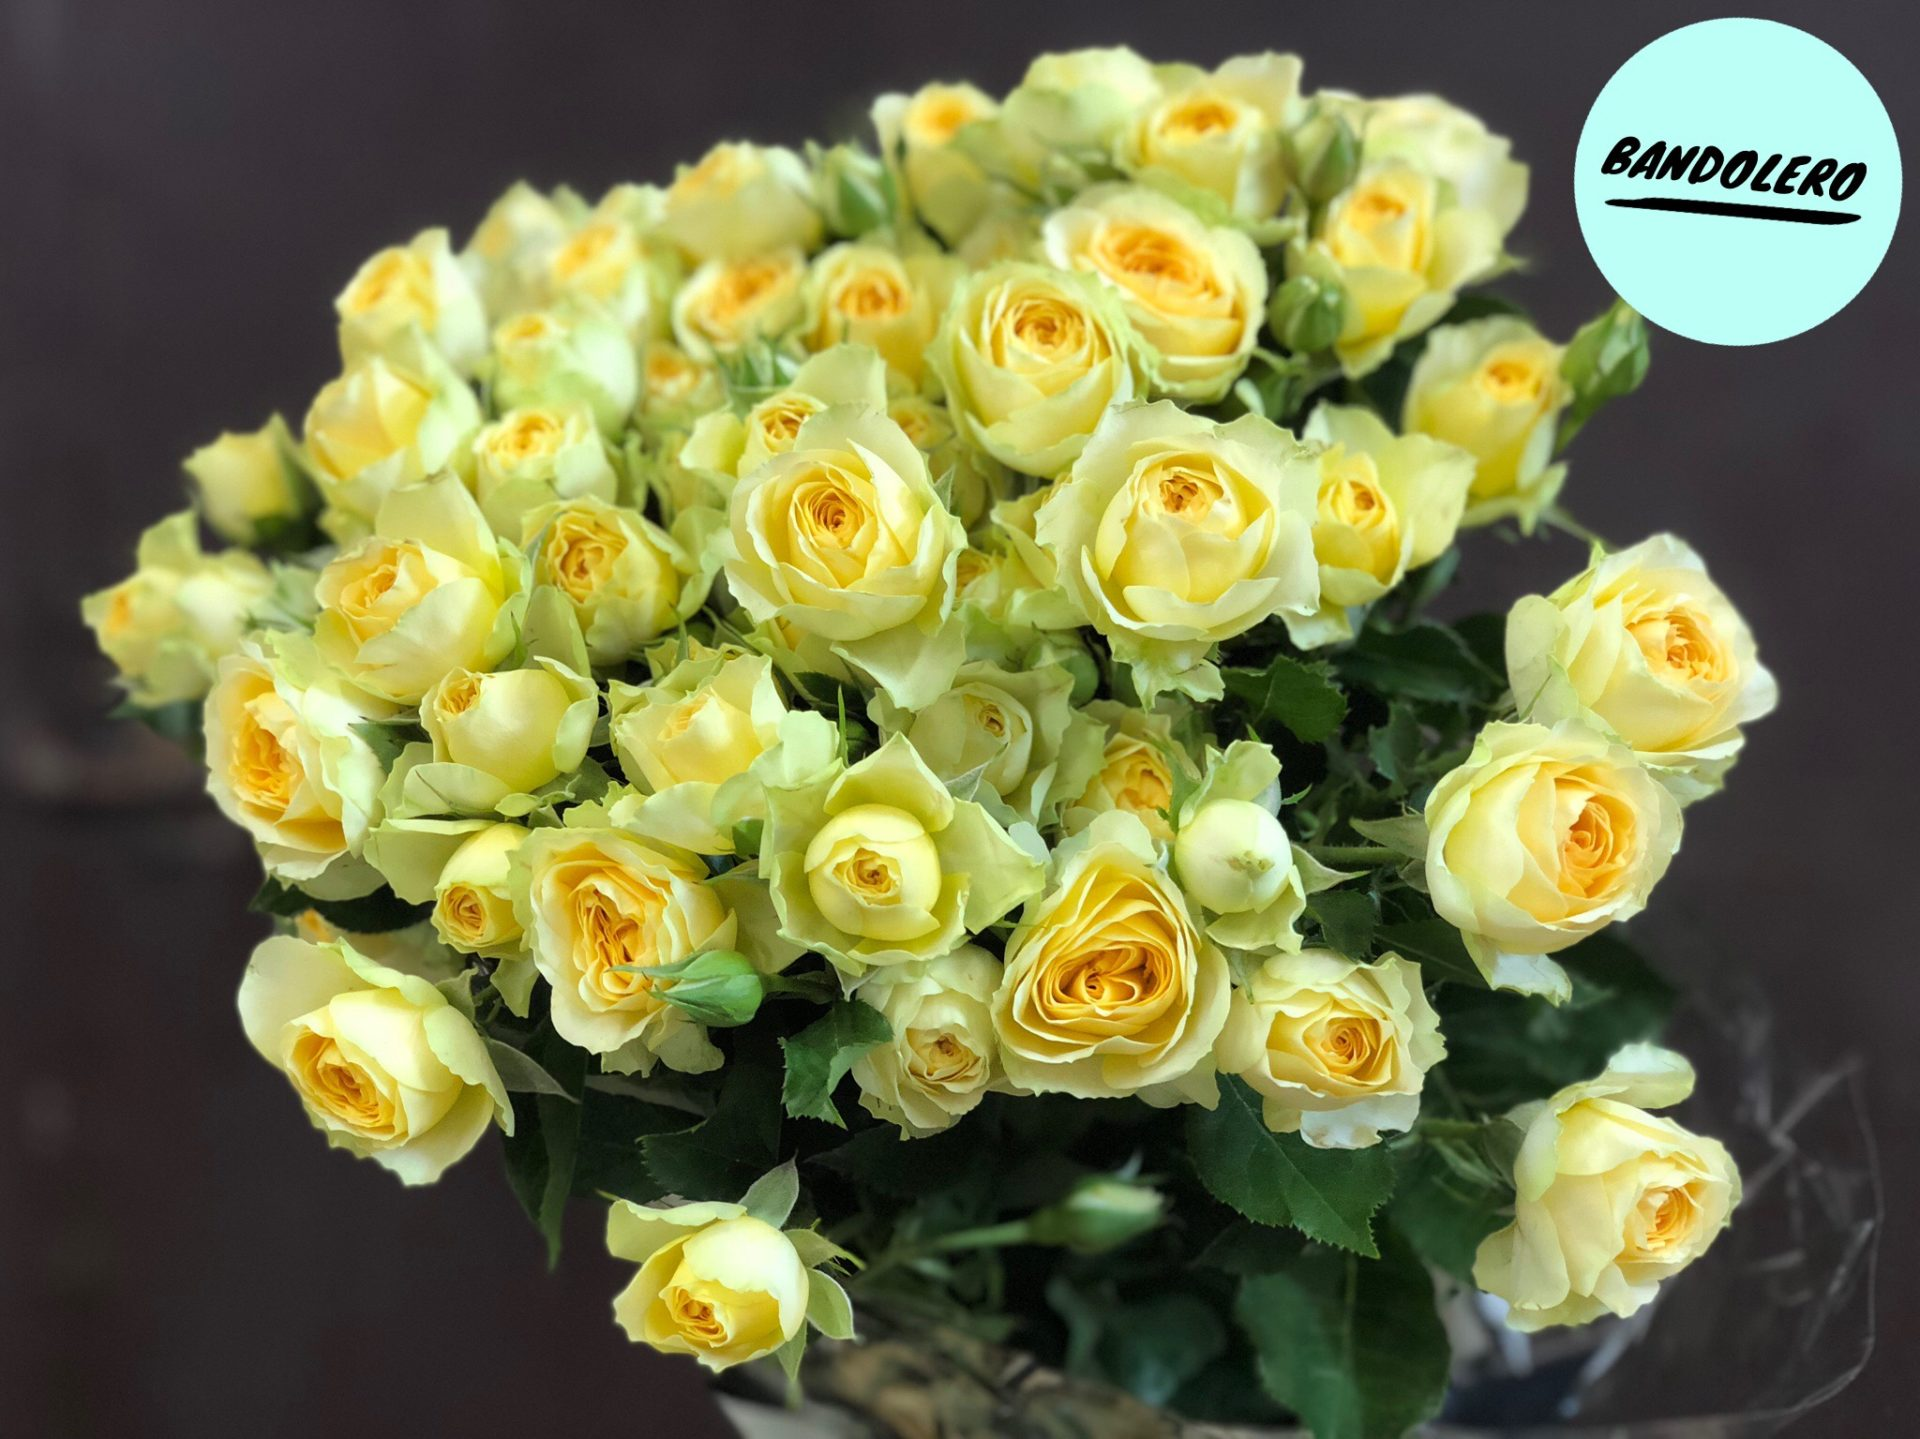 Роза Бандолеро изображение 4